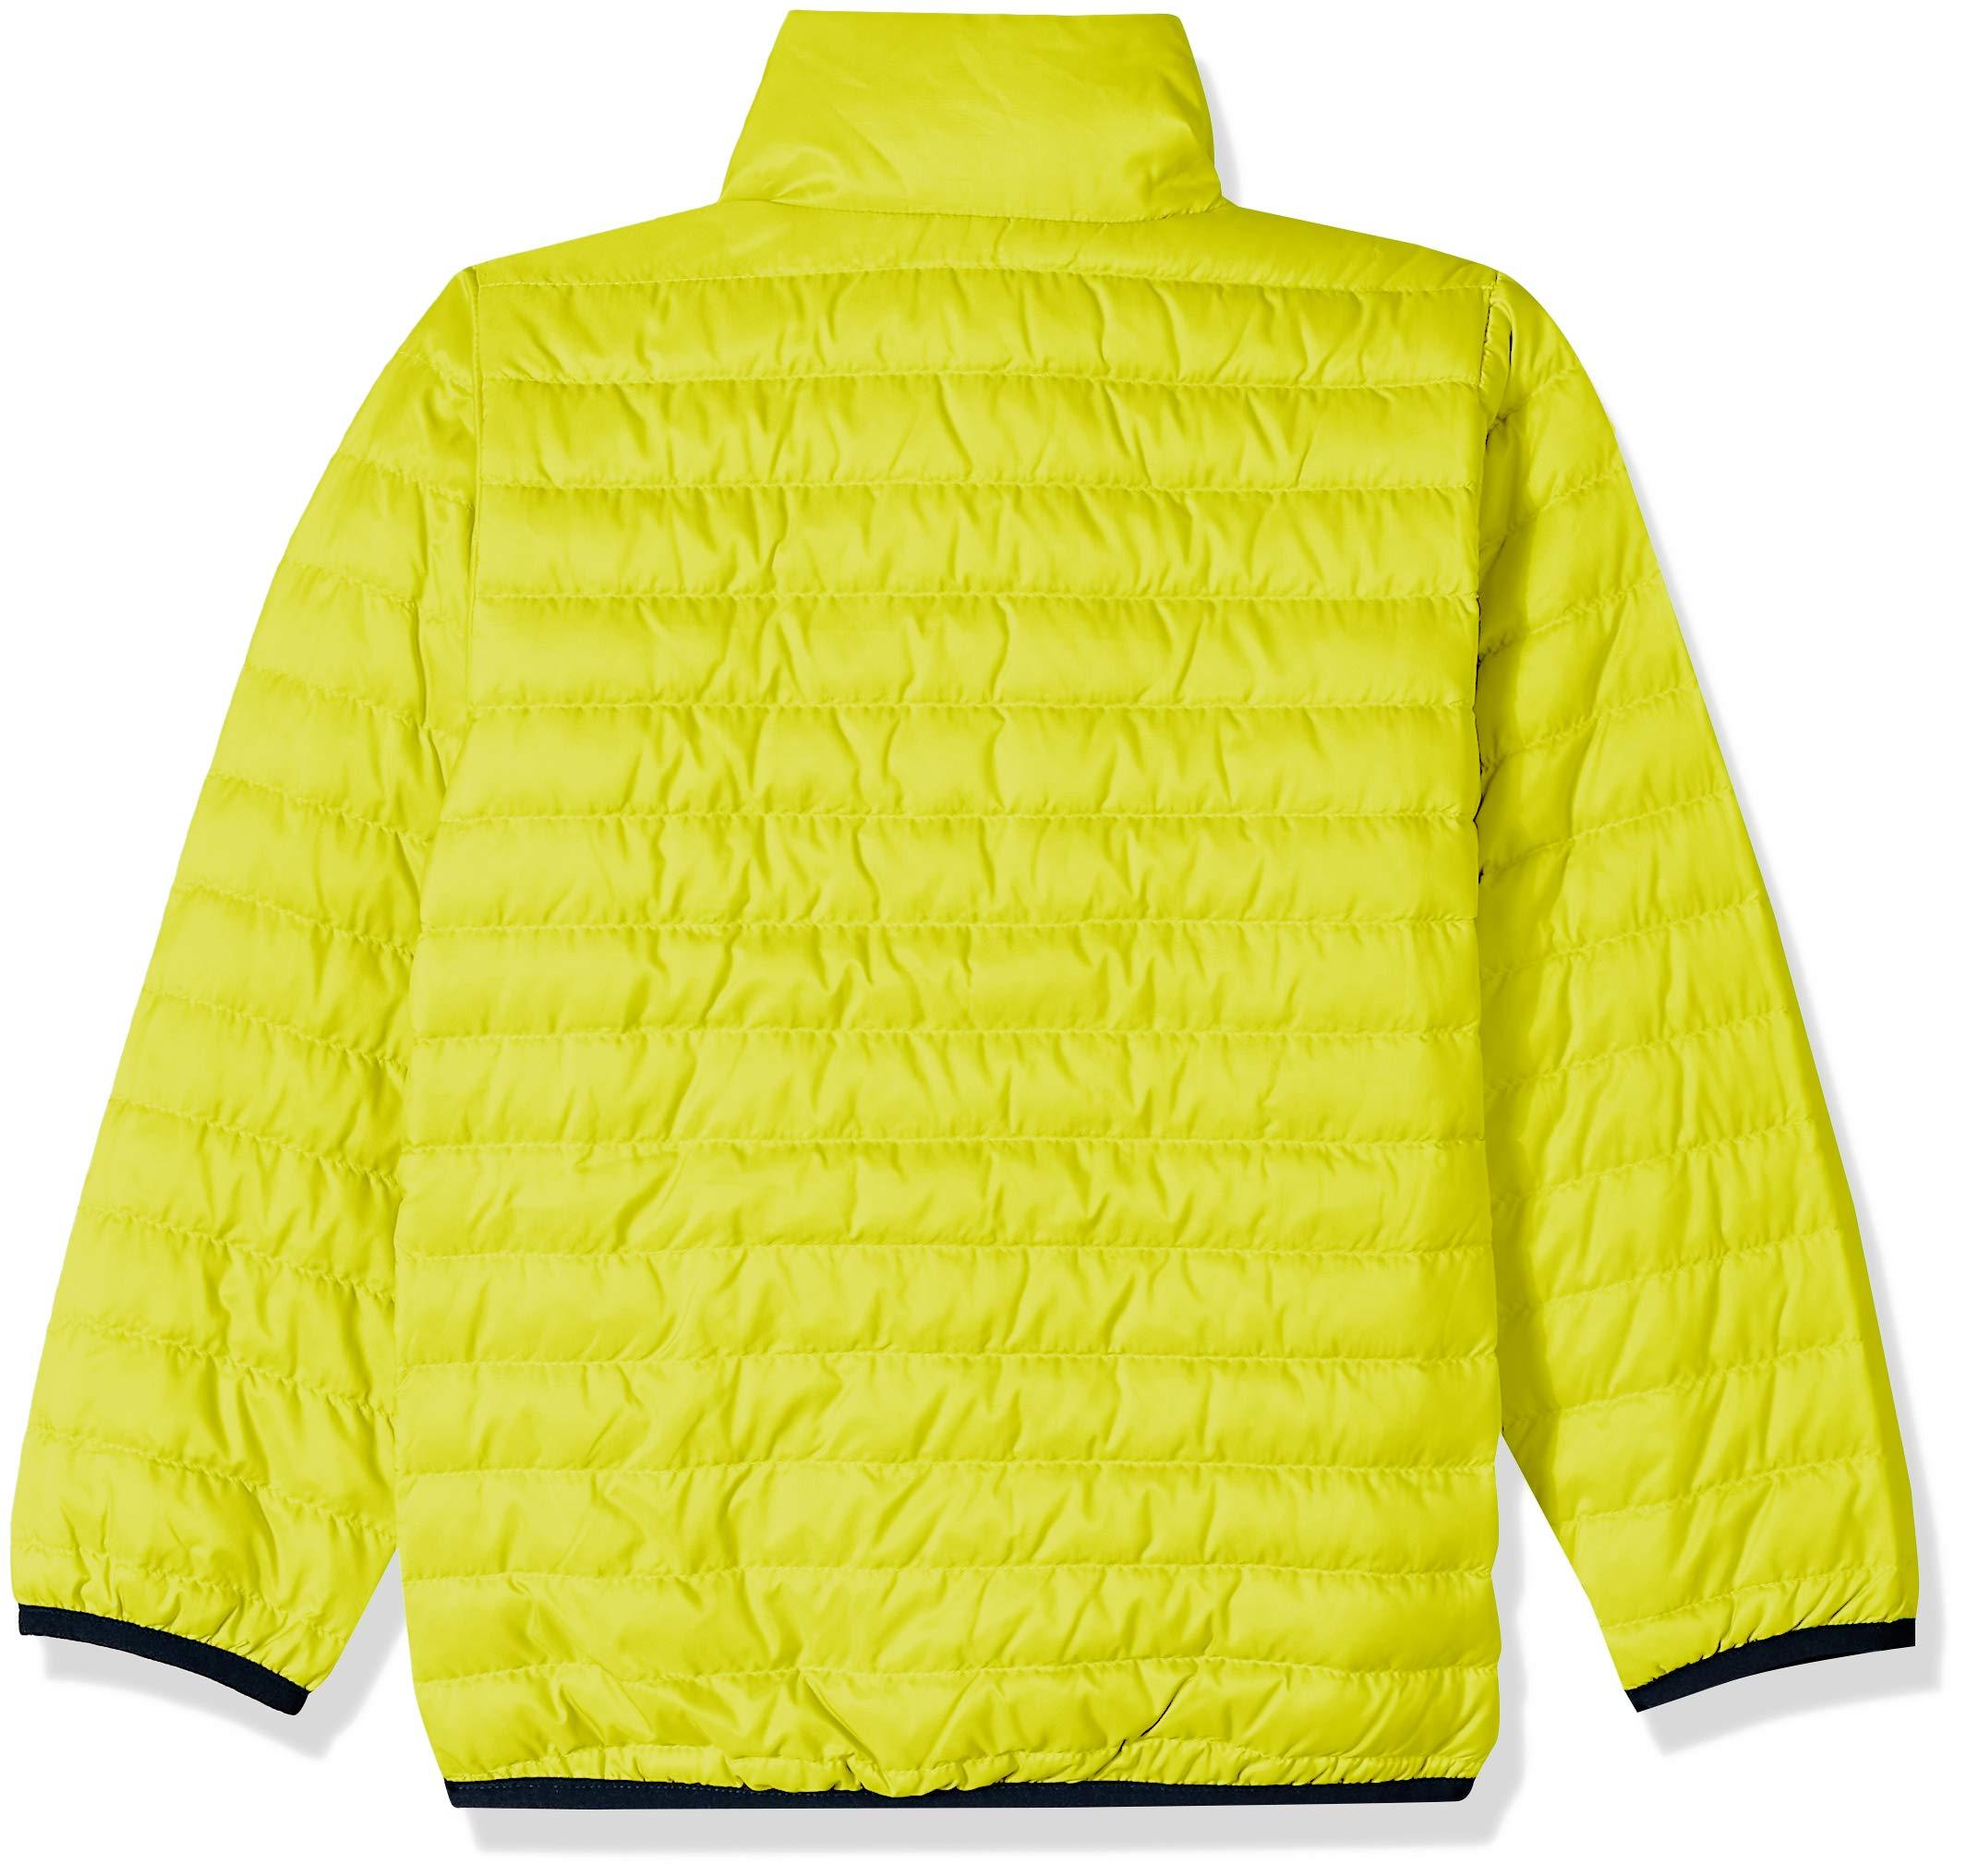 Helly Hansen K Barrier Down Insulator Jacket, Sweet Lime, Size 6 by Helly Hansen (Image #2)